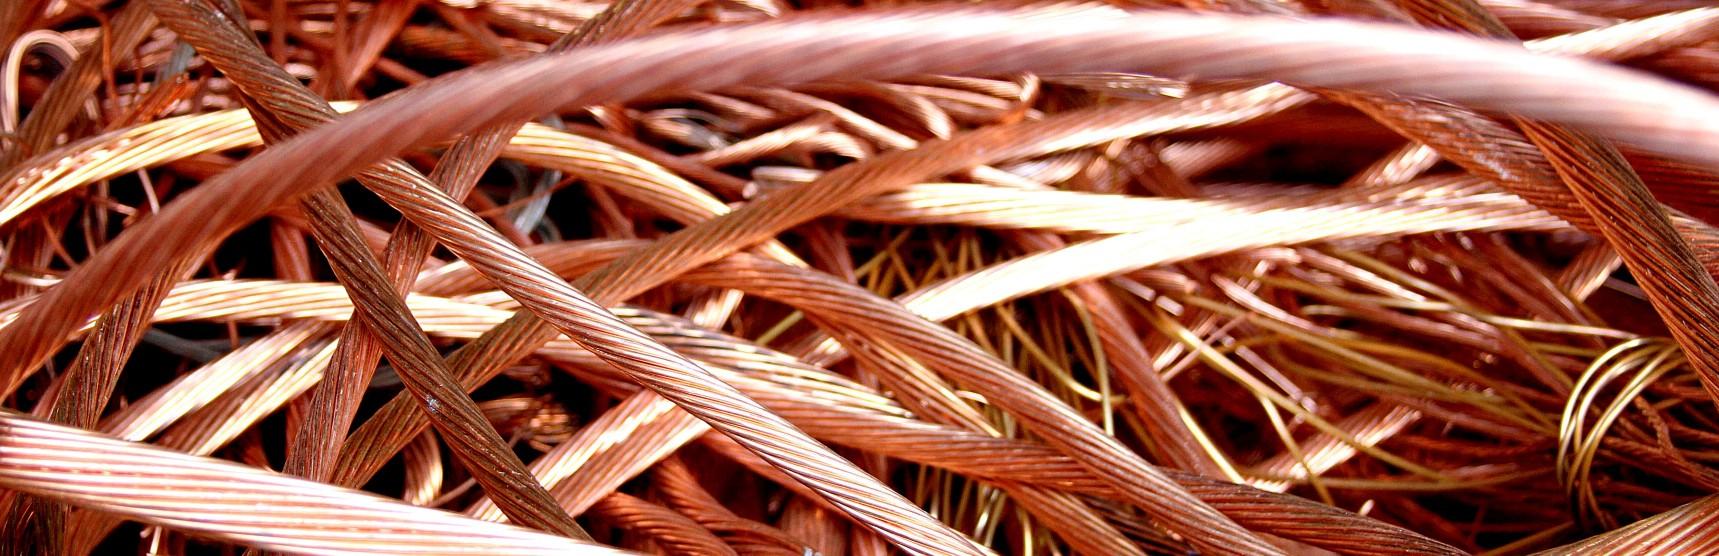 Non-Ferrous Metals - Ferris Processing & Trading - Scrap Metal